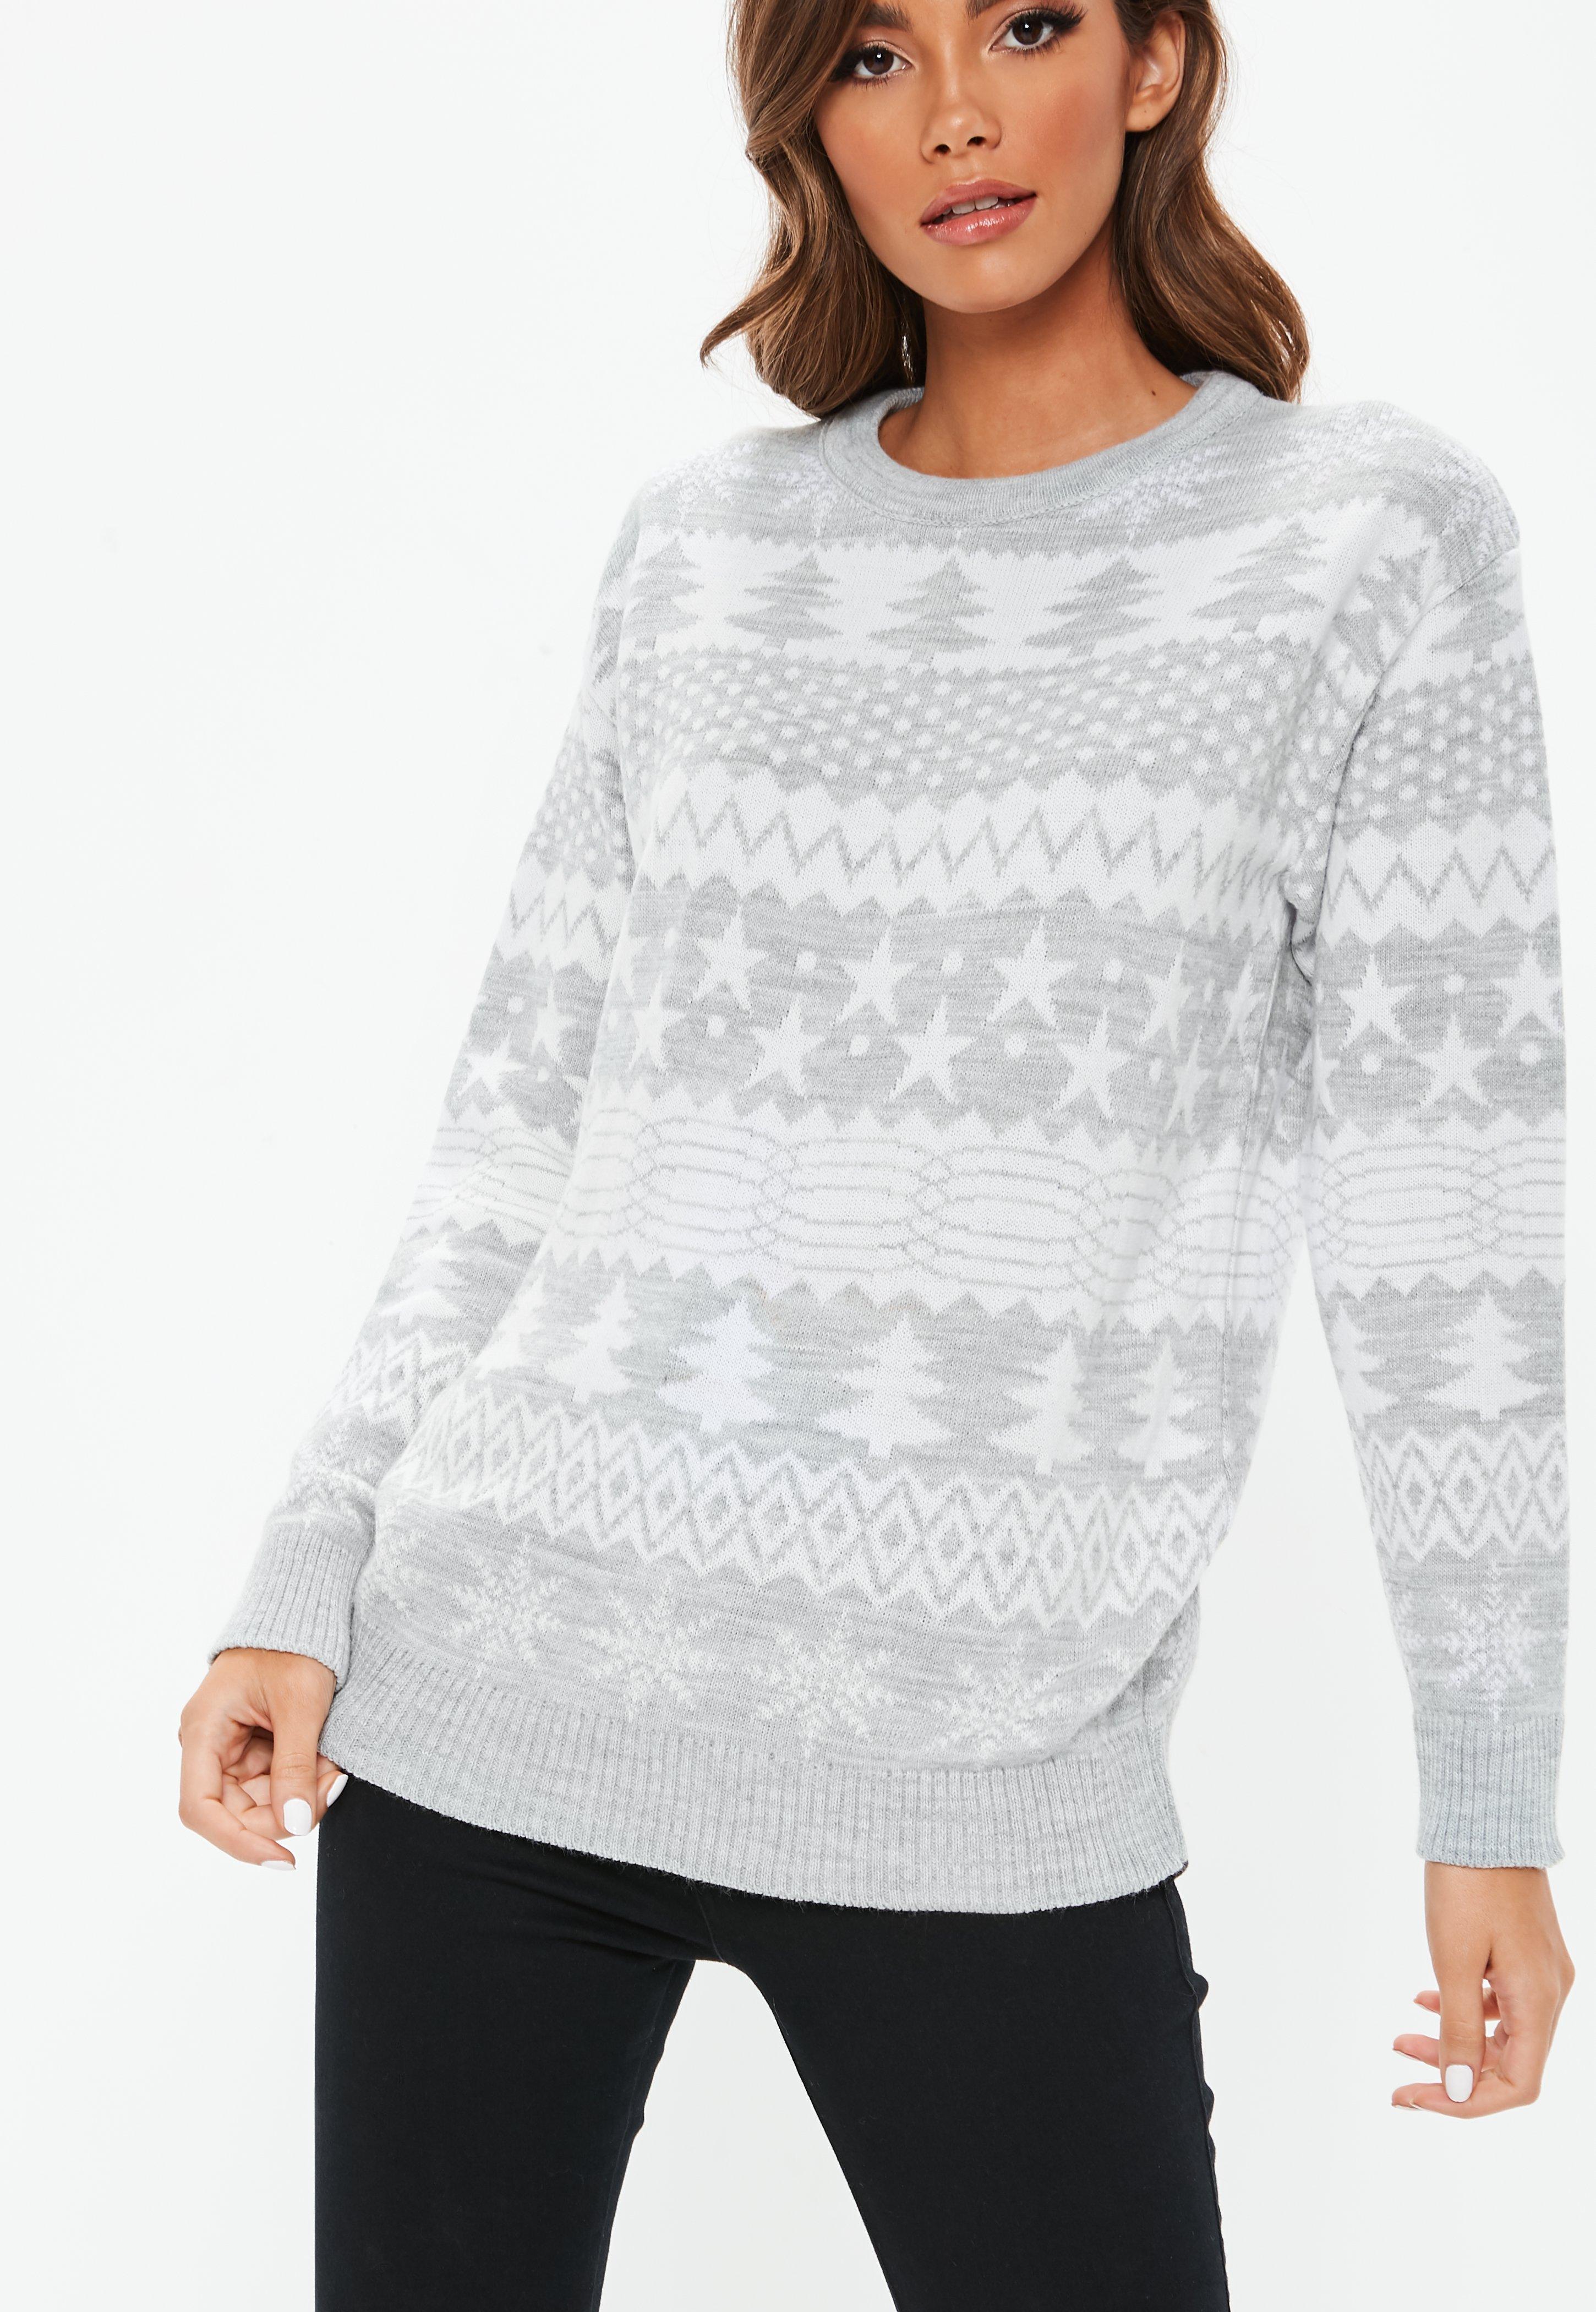 845659c518 ... Grey Knitted Printed Christmas Jumper - Lyst. View fullscreen